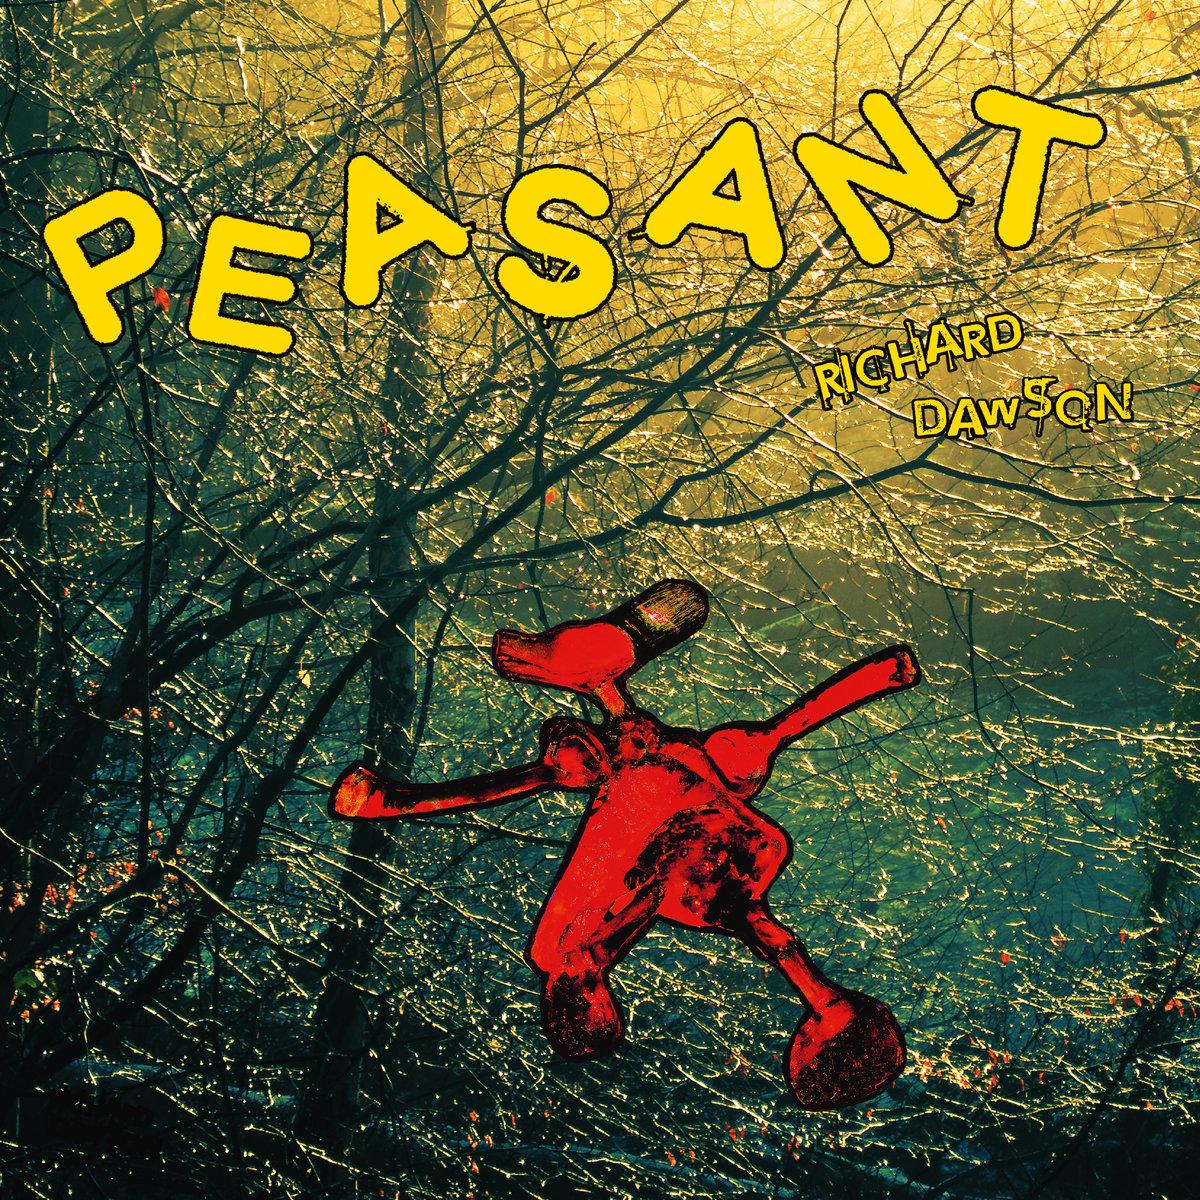 Peasant - Richard Dawson